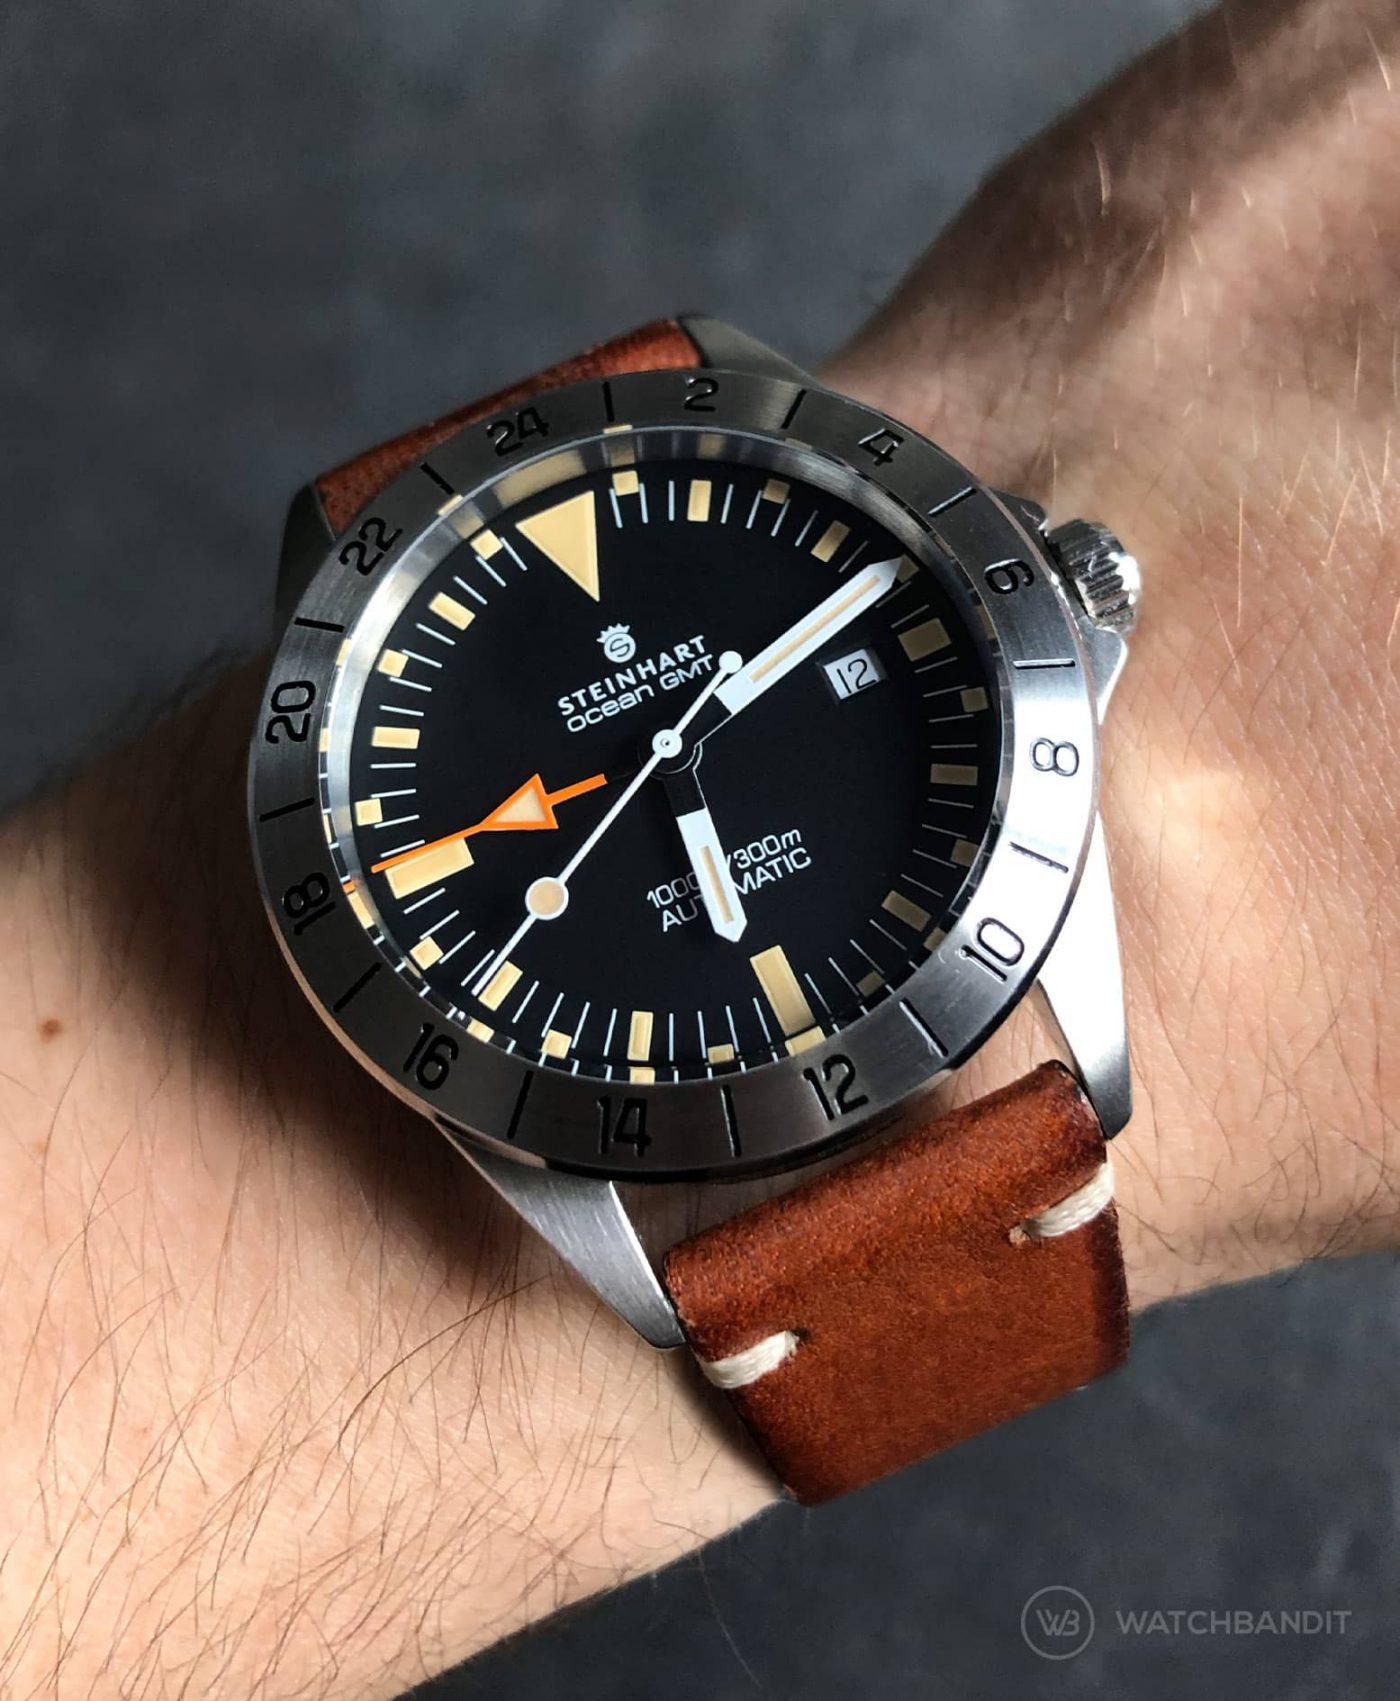 Steinhart Ocean Vintage GMT Strap guide brown vintage leather